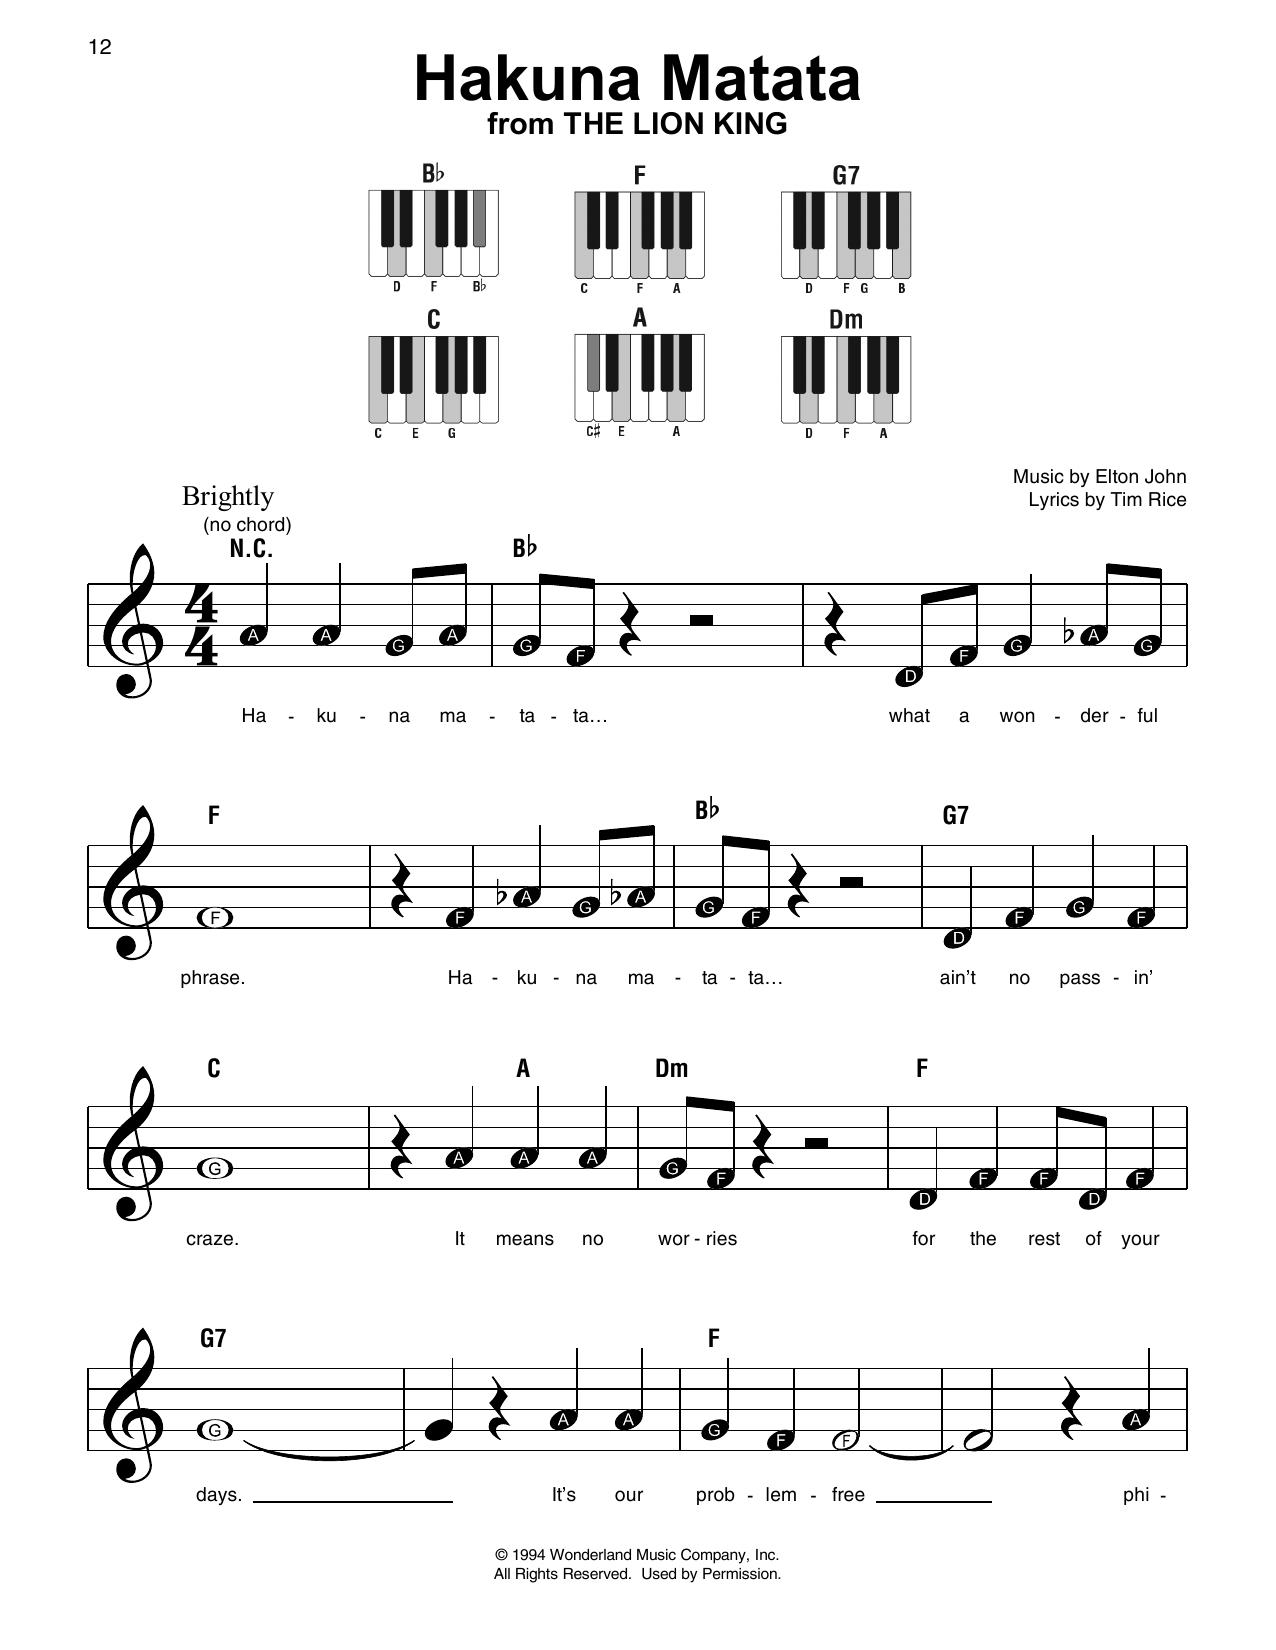 Hakuna matata sheet music direct sheet preview hexwebz Gallery